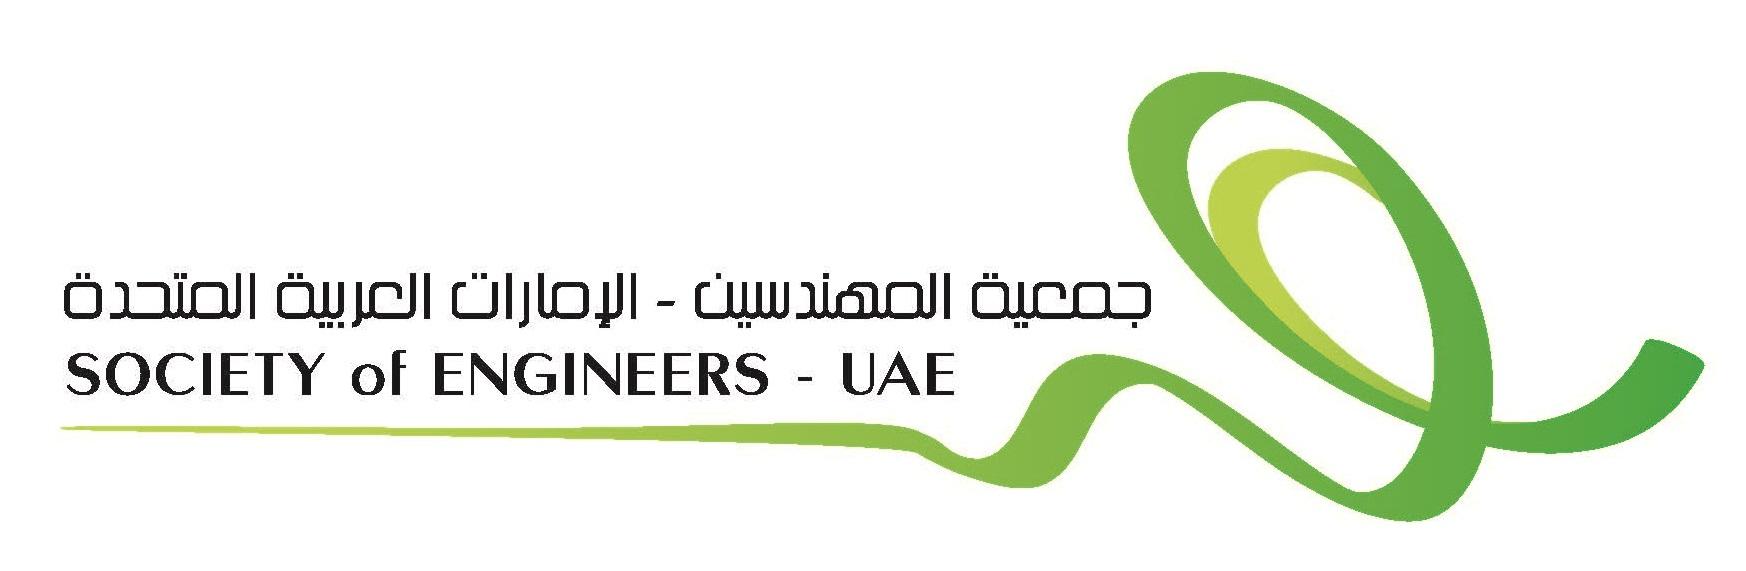 SOE logo crop